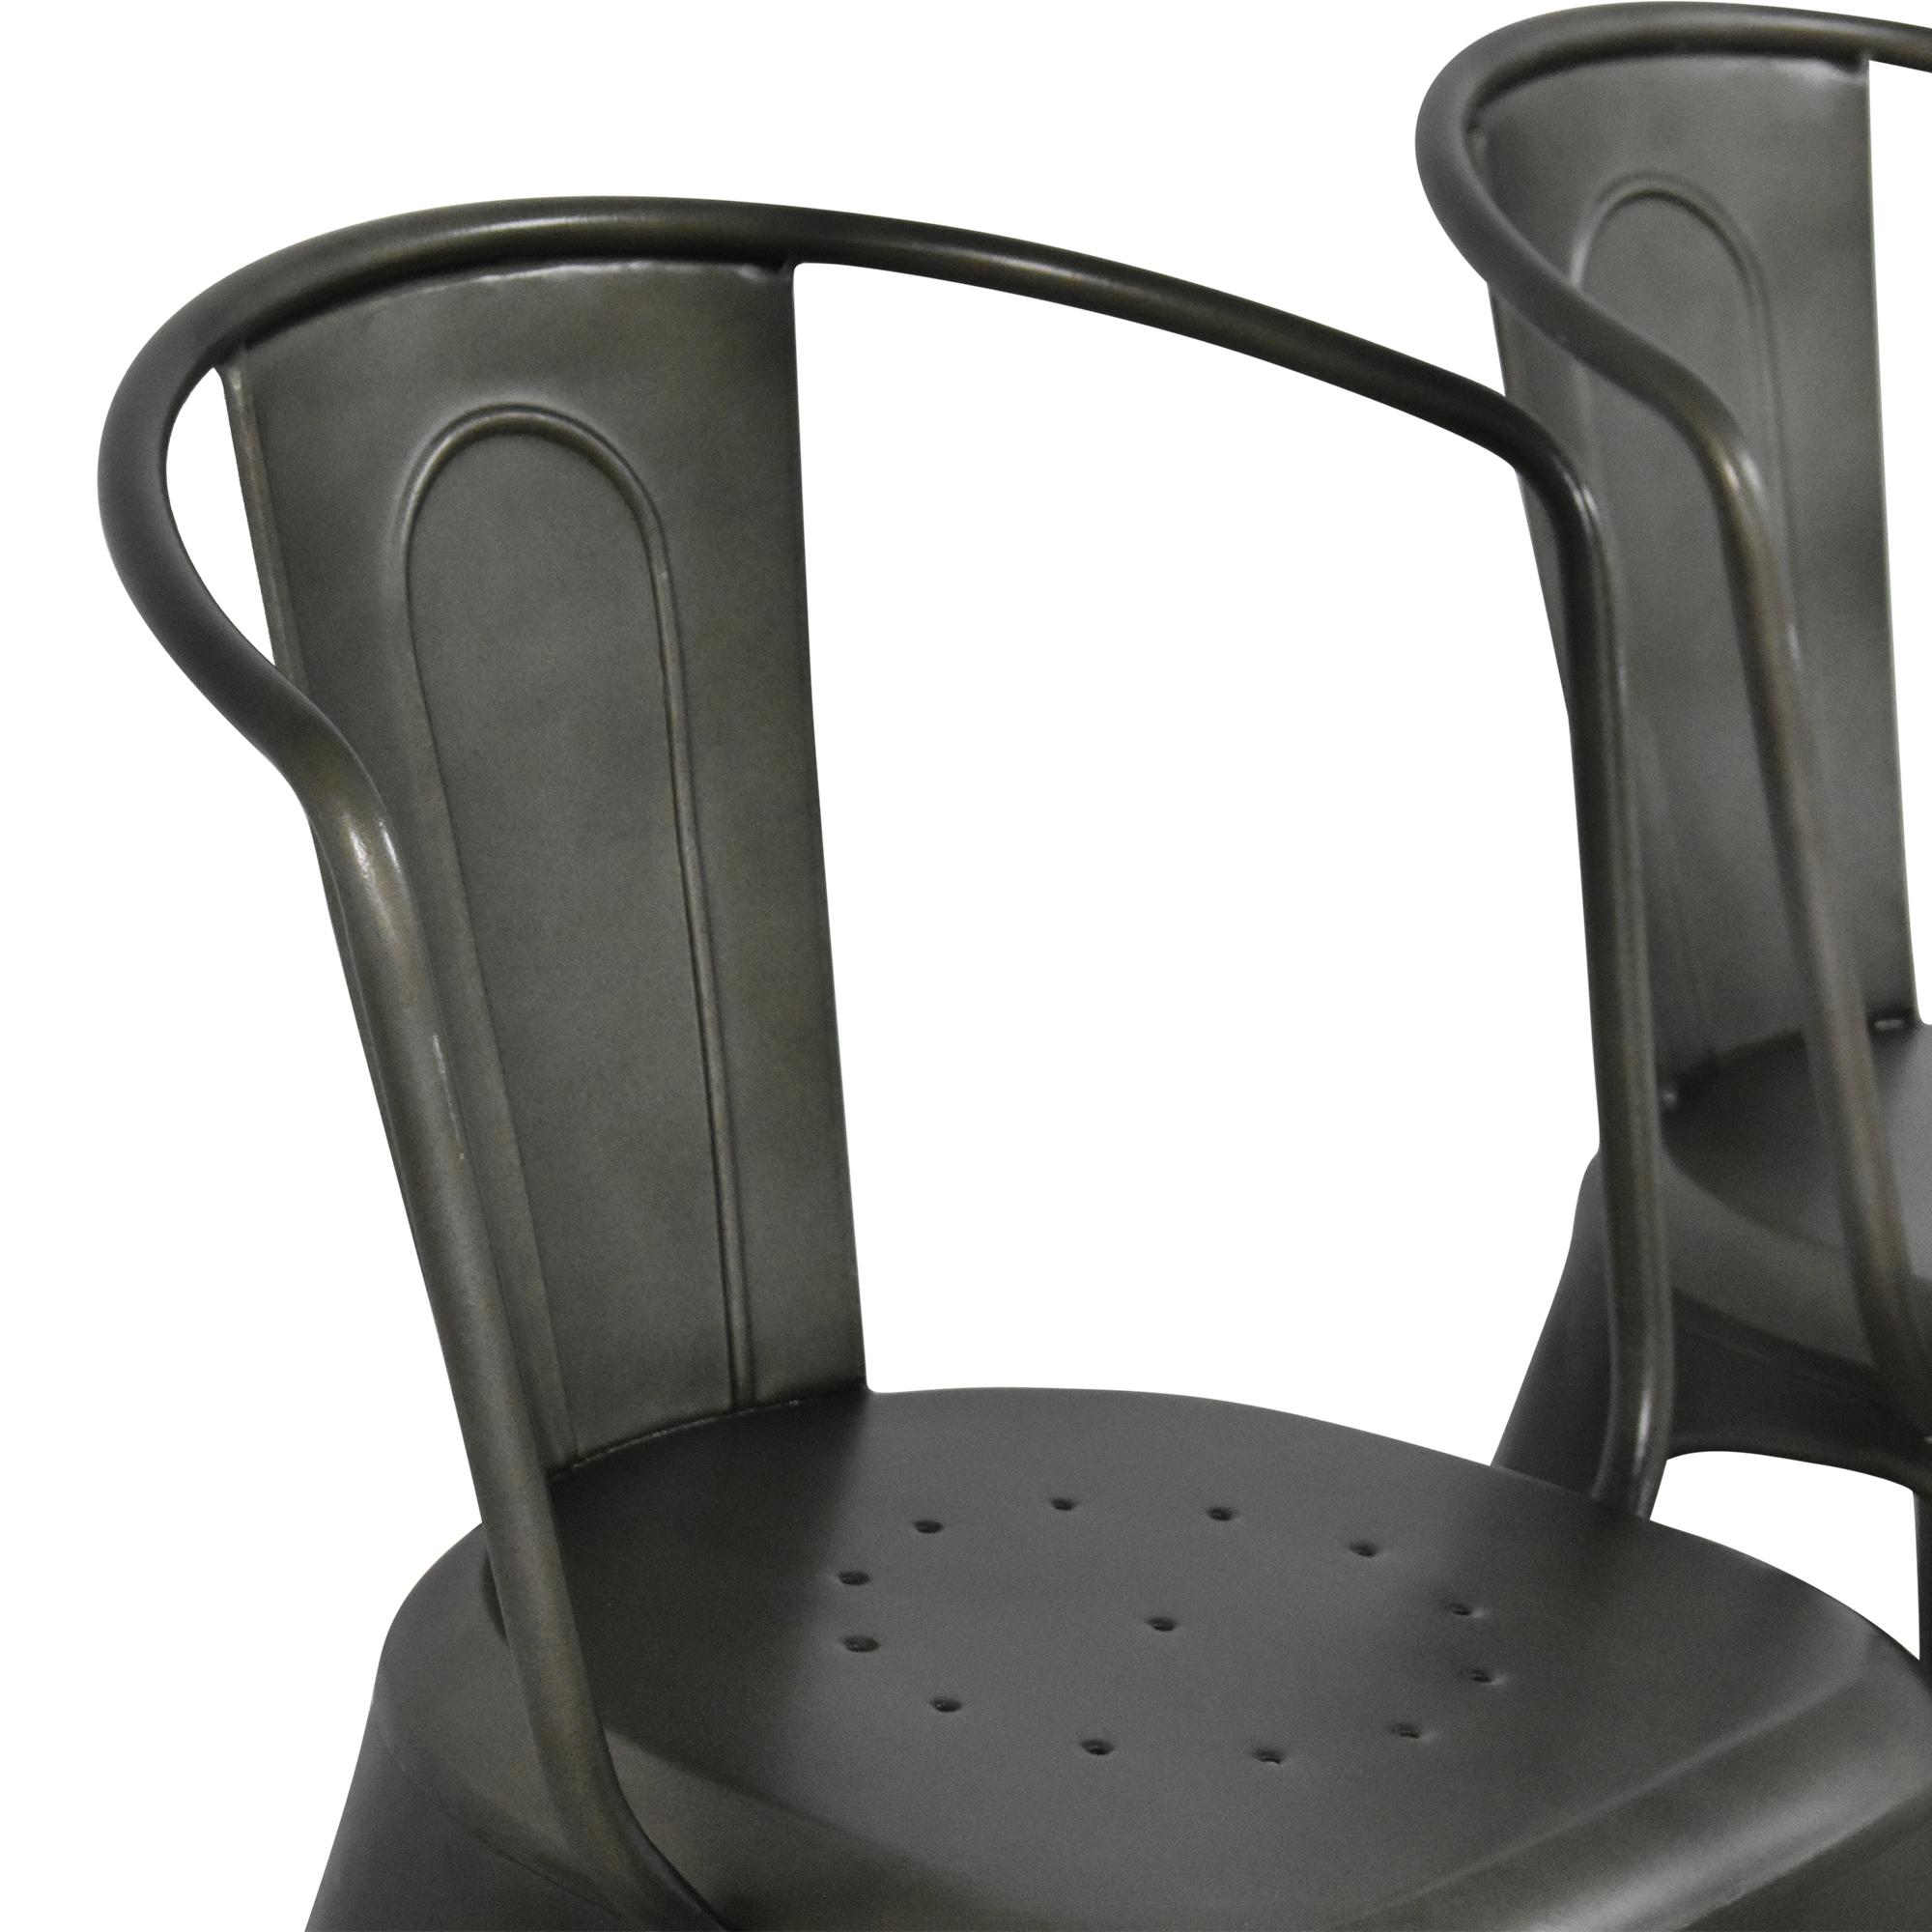 Restoration Hardware Marcel Modern Armchairs / Chairs